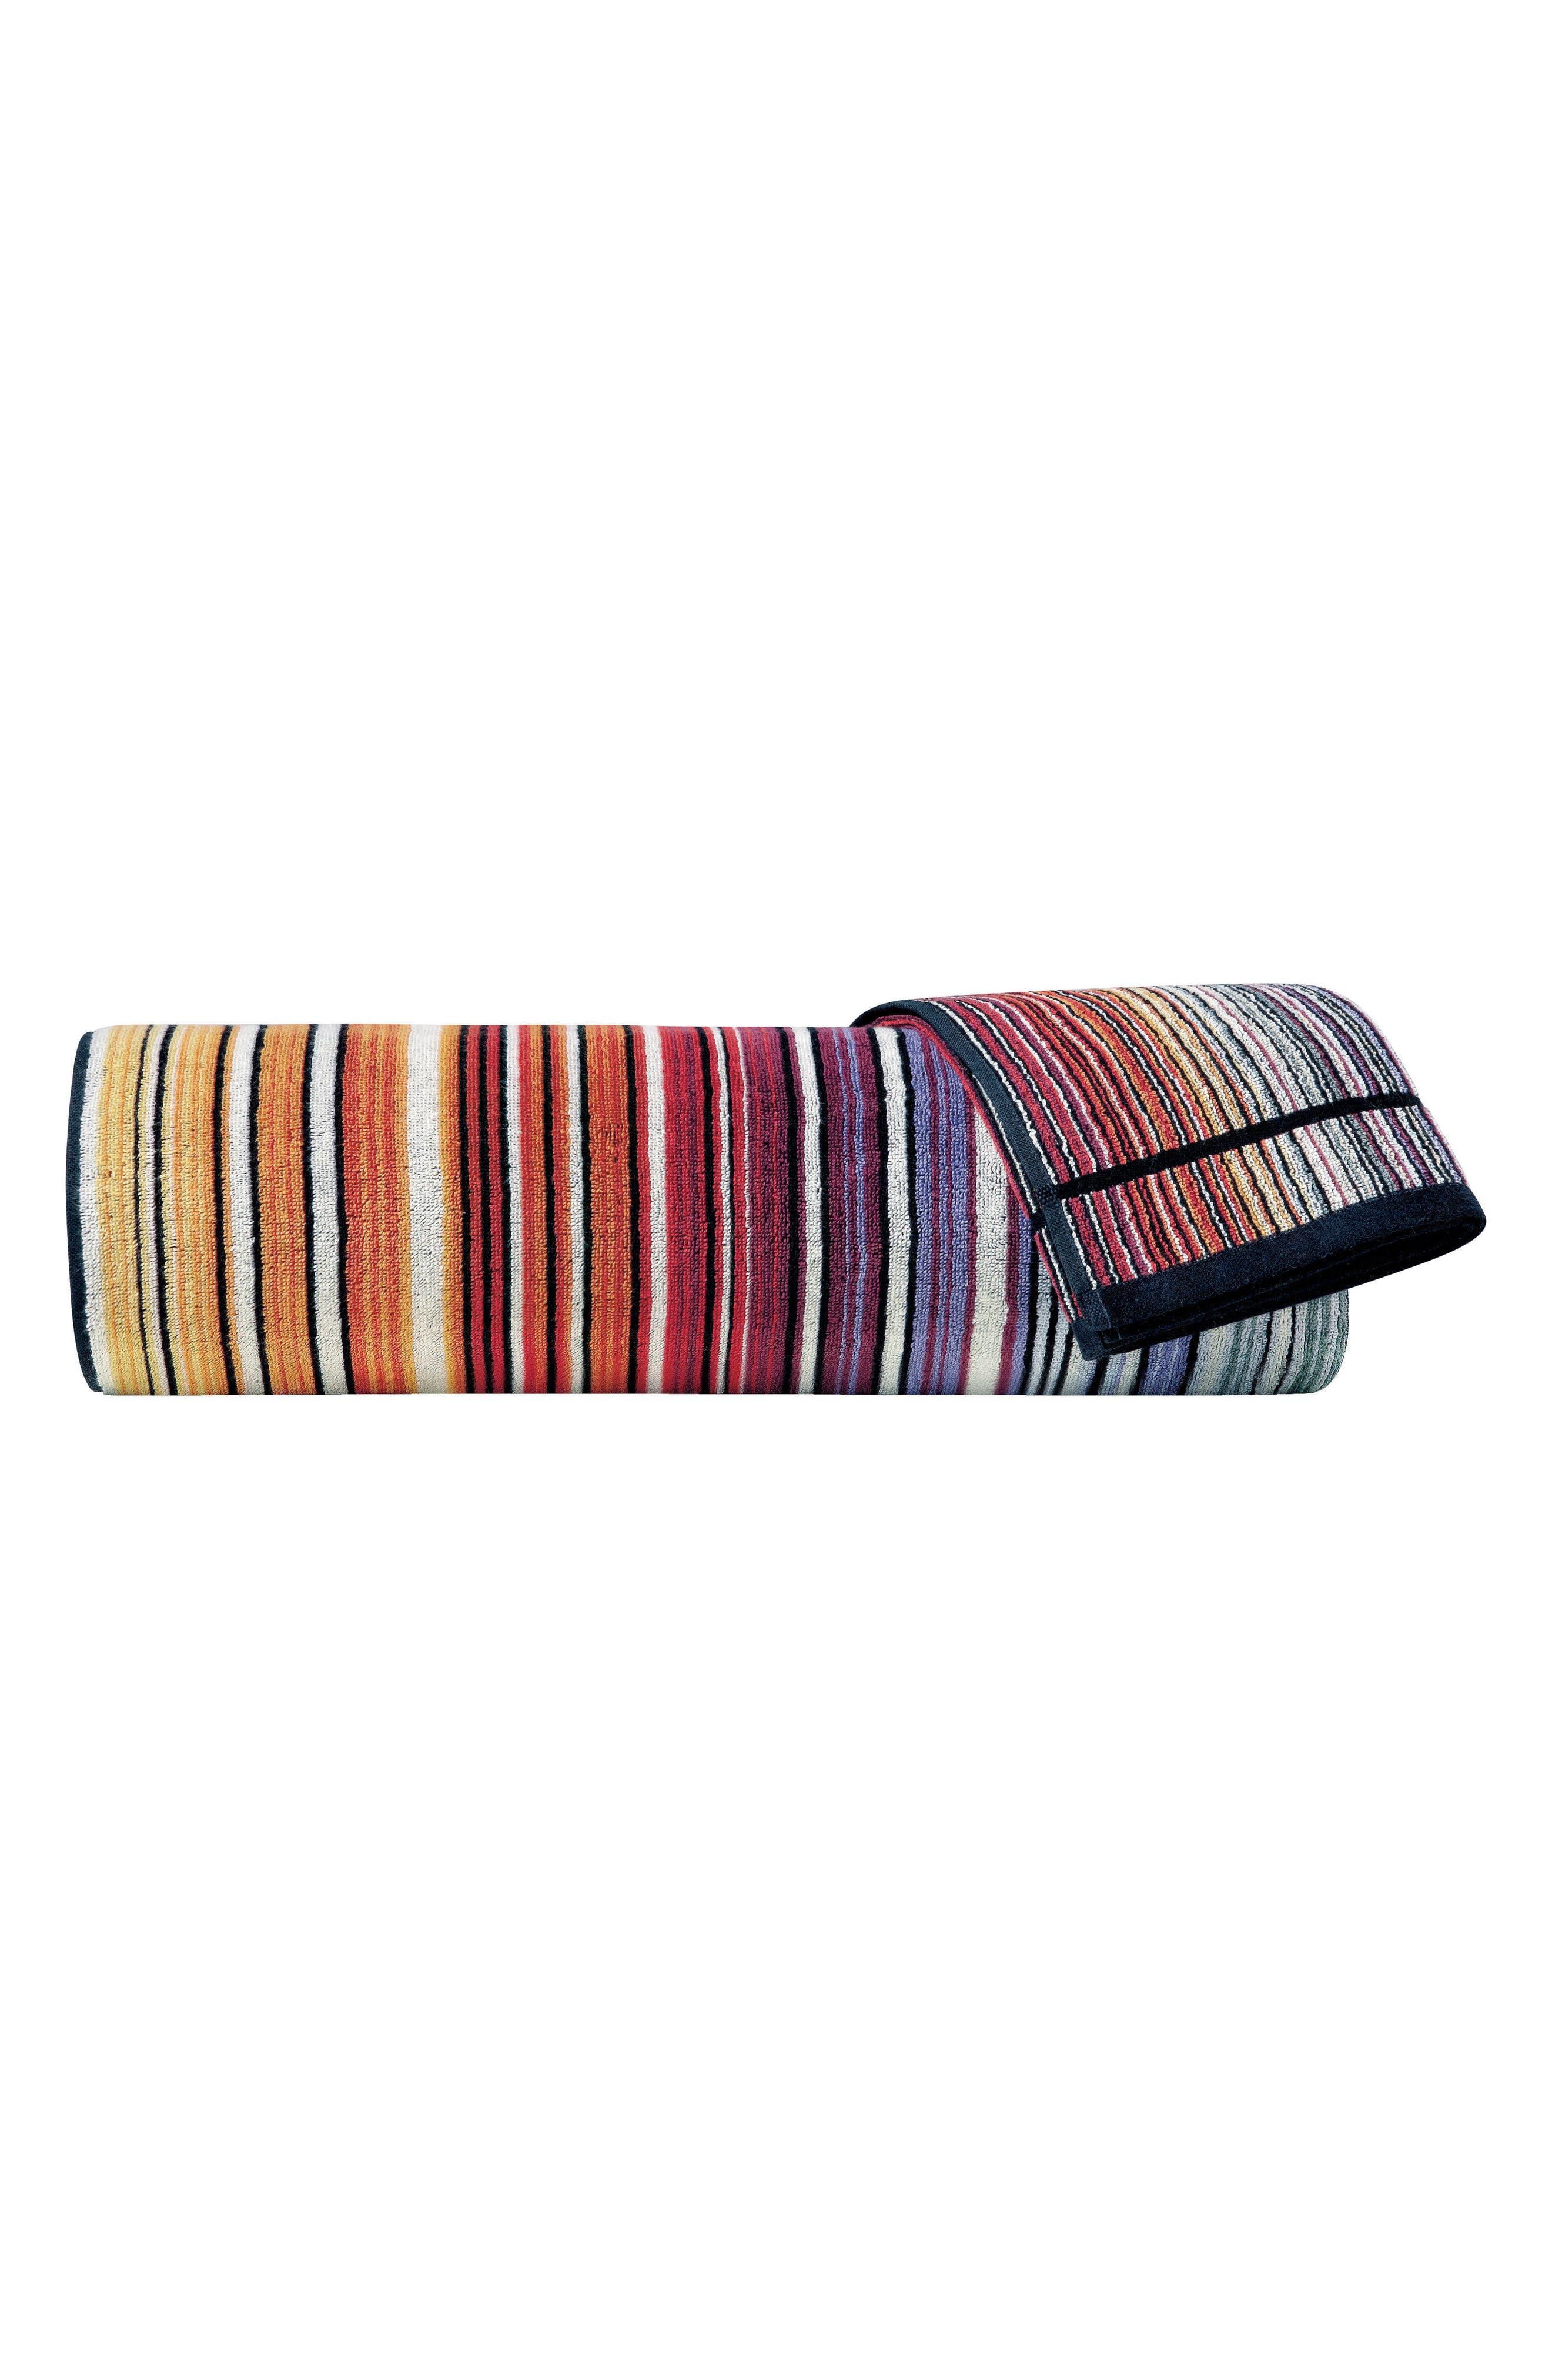 Missoni Tabata Bath Towel,                             Main thumbnail 1, color,                             600